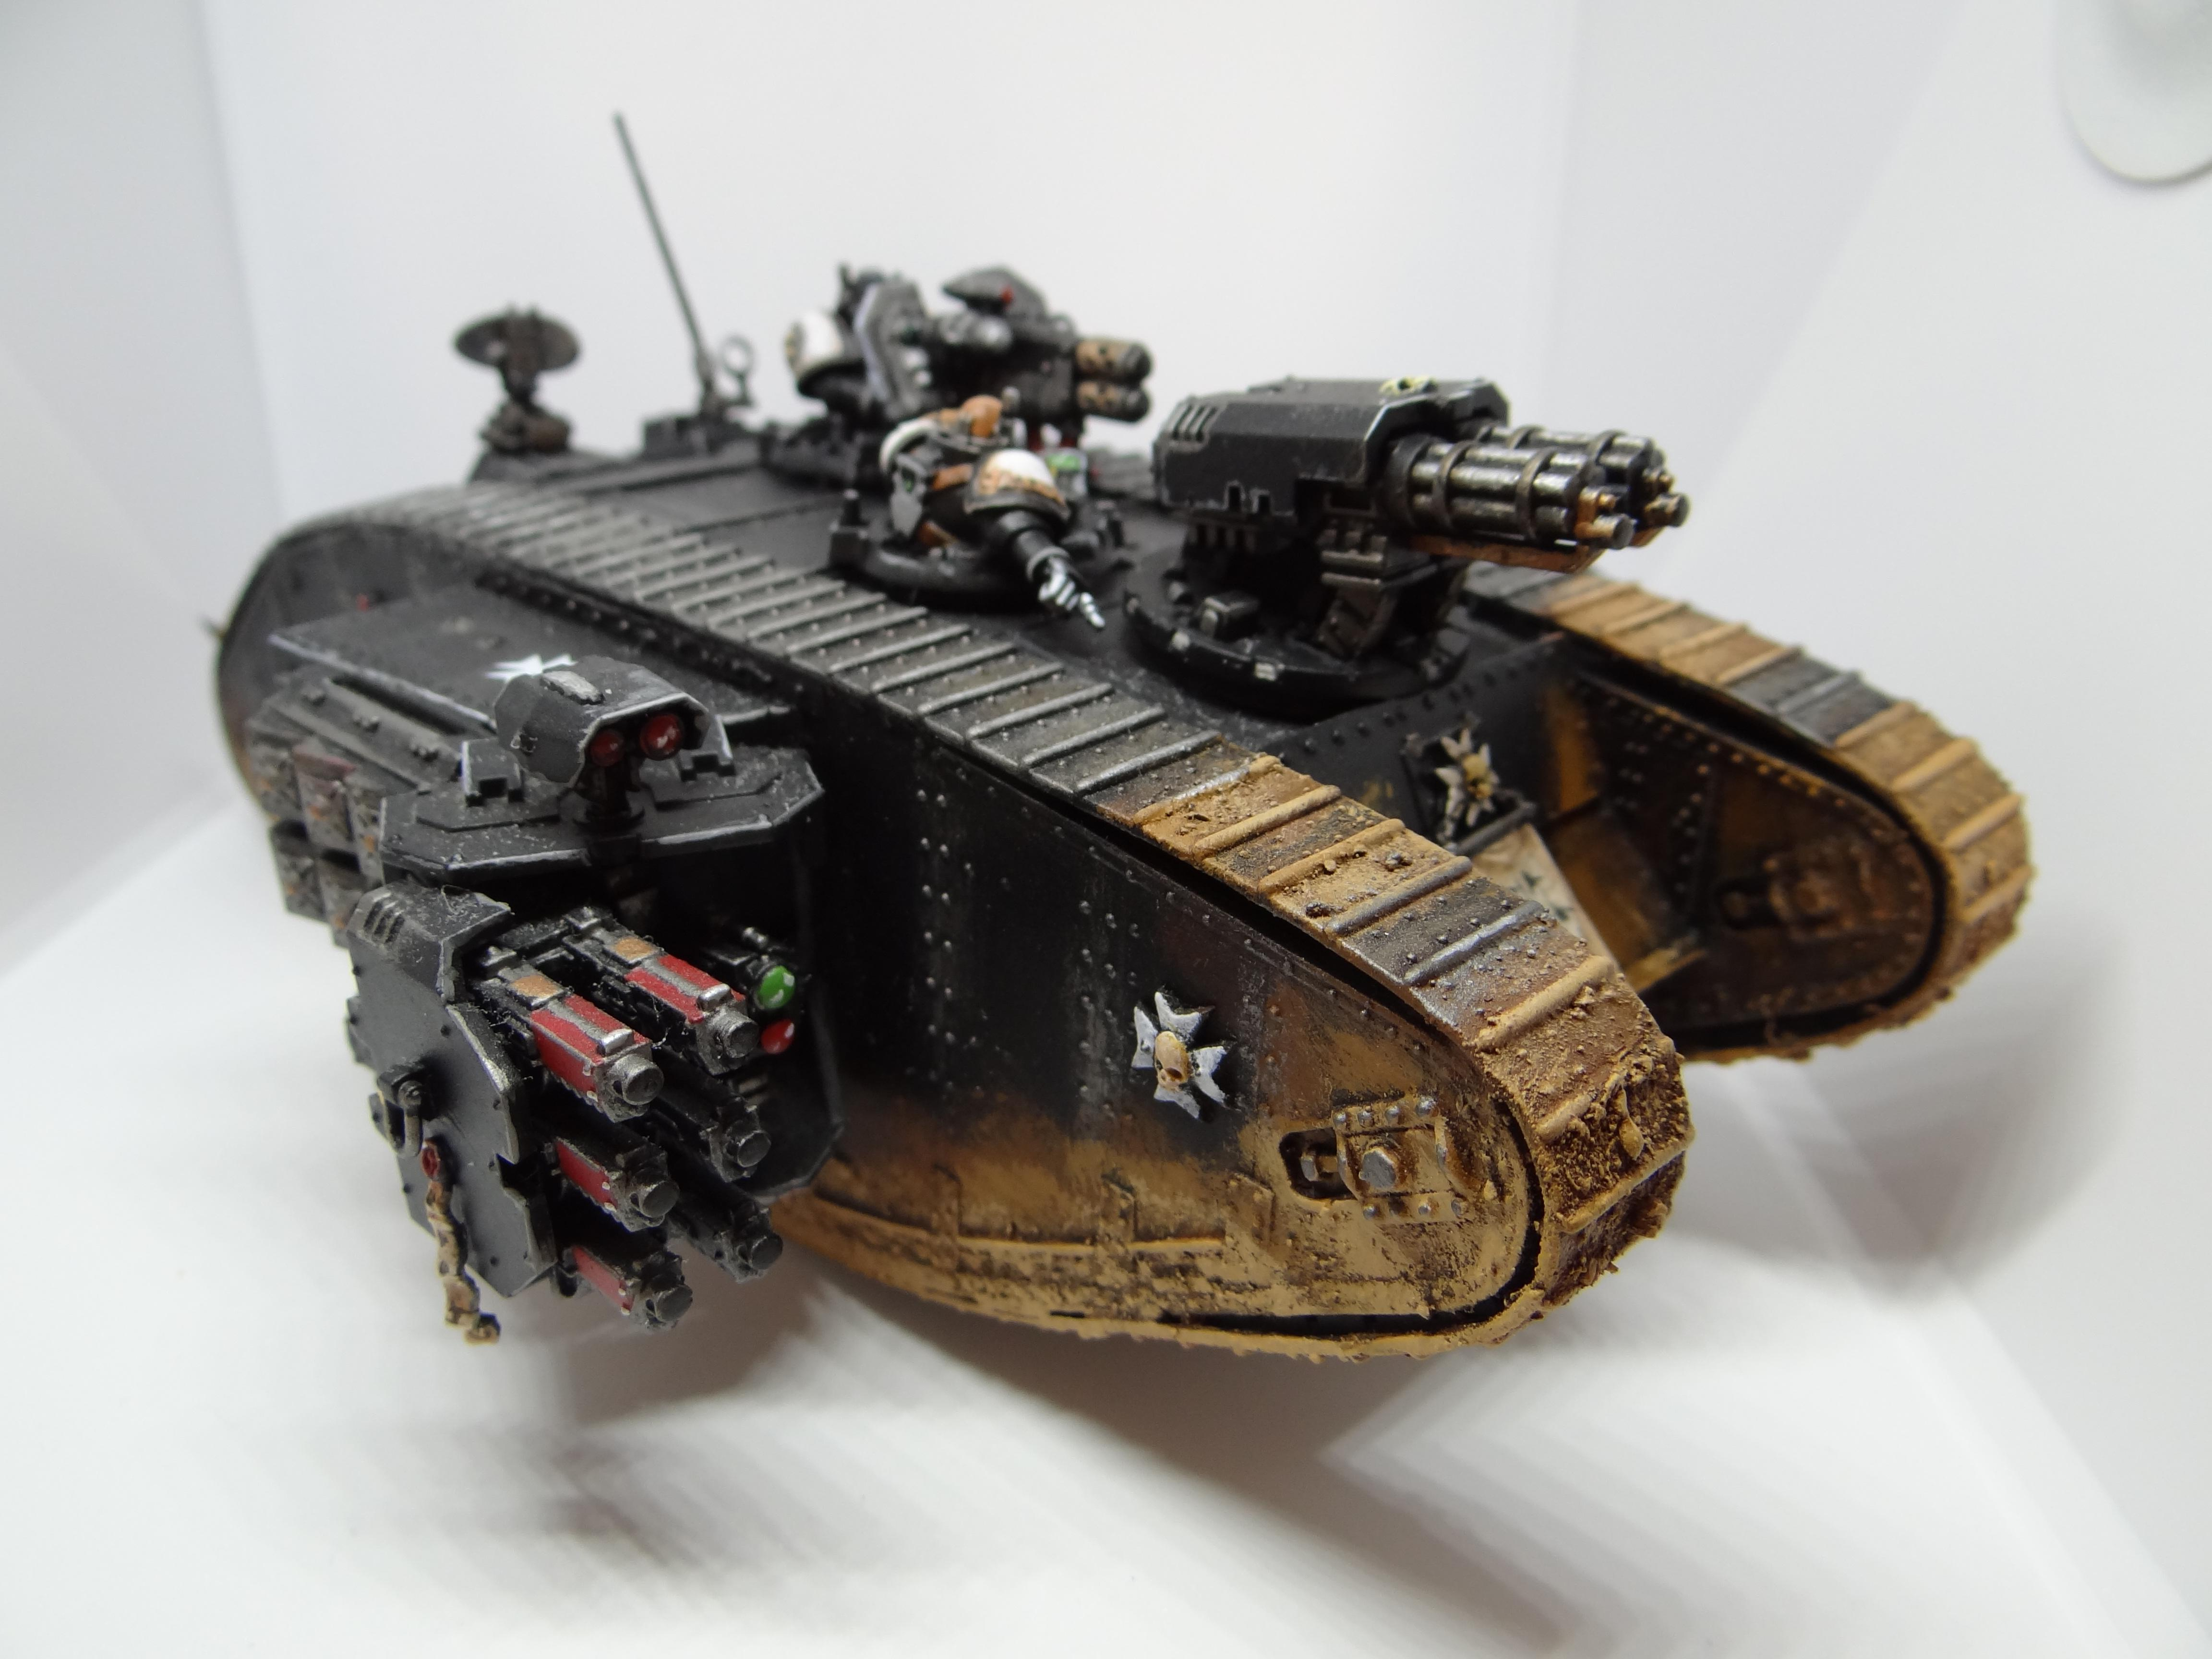 Black Templars, Land Raider, Proxy, Space Marines